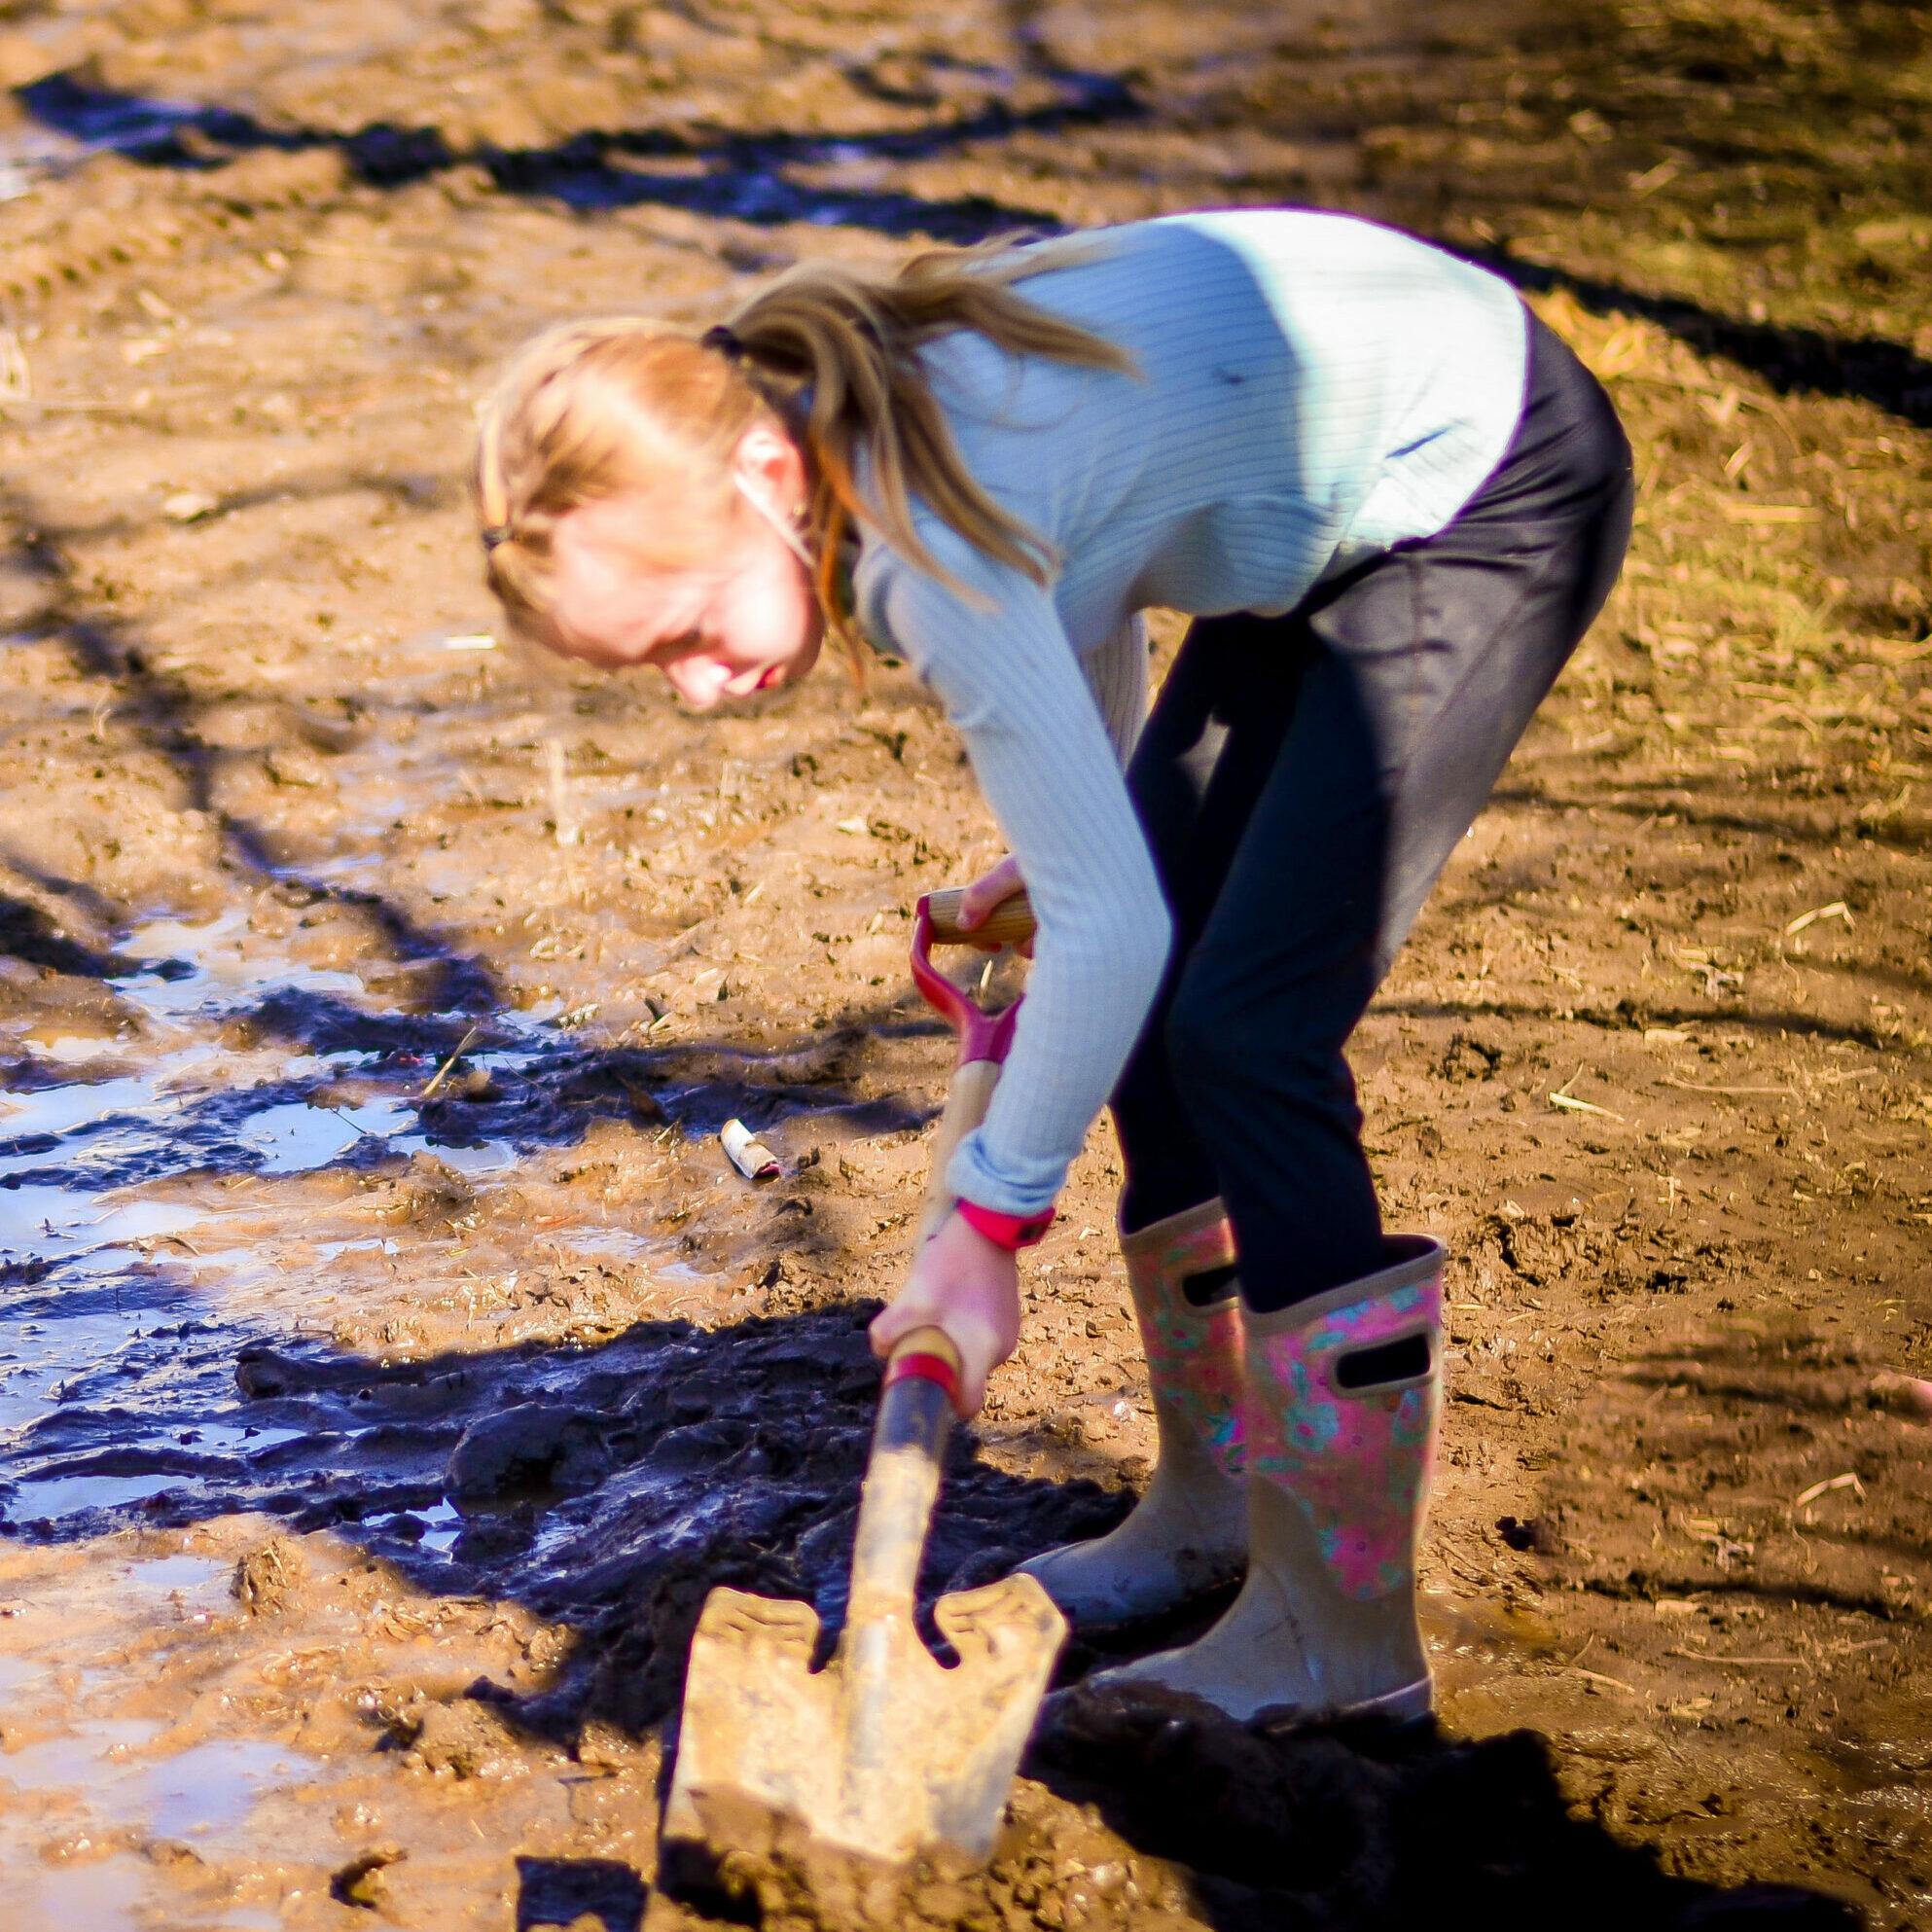 Student shoveling mud